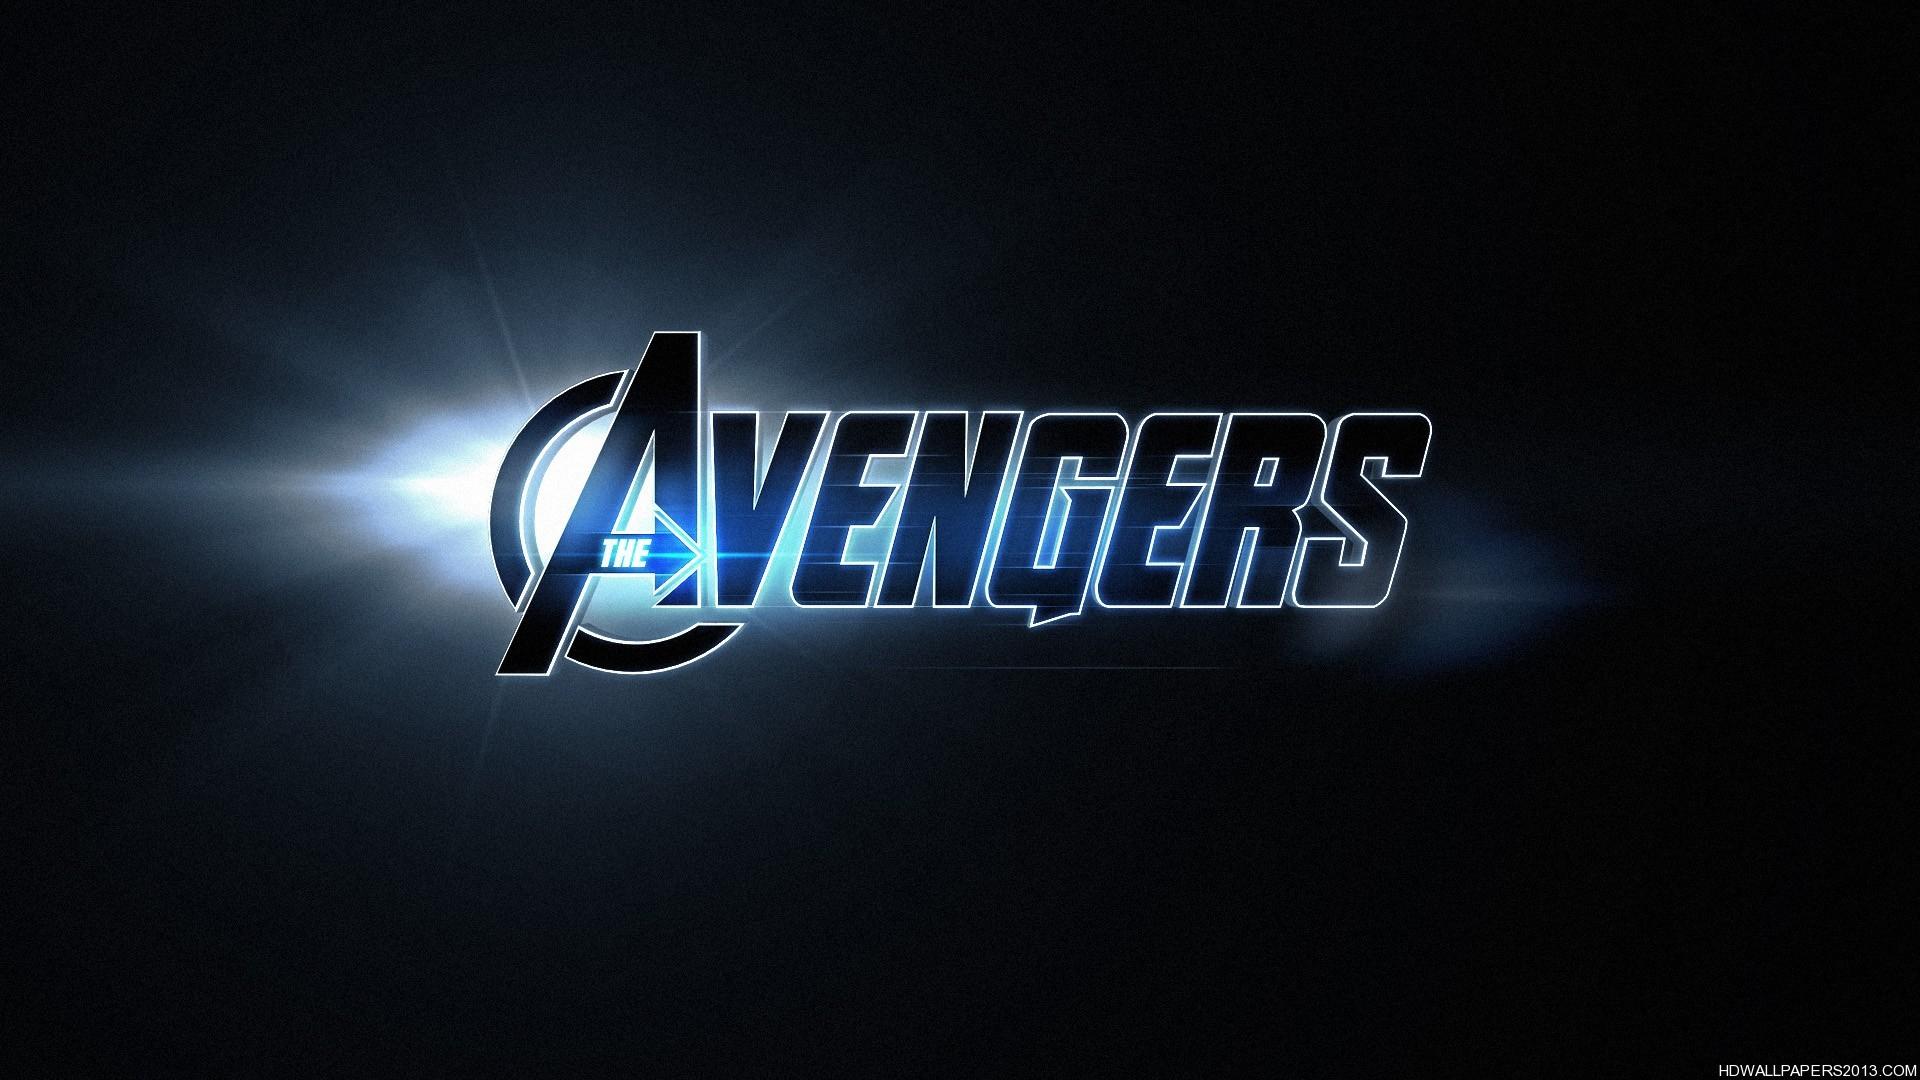 Res: 1920x1080, The Avengers Logo Wallpaper